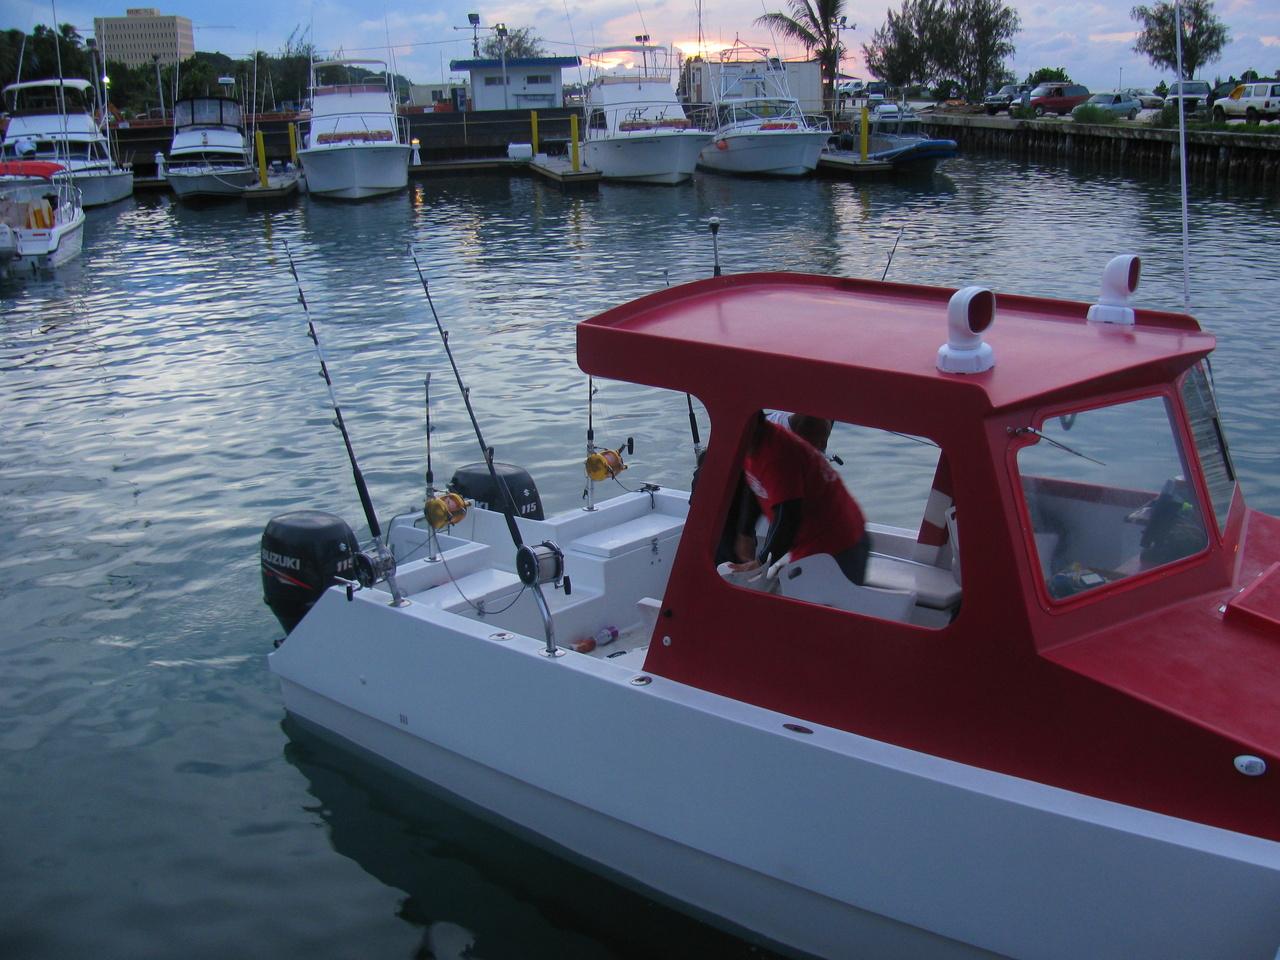 Fishing boat in the Agana Boat Basin, Guam. Photo: NOAA Fisheries/Justin Hospital.